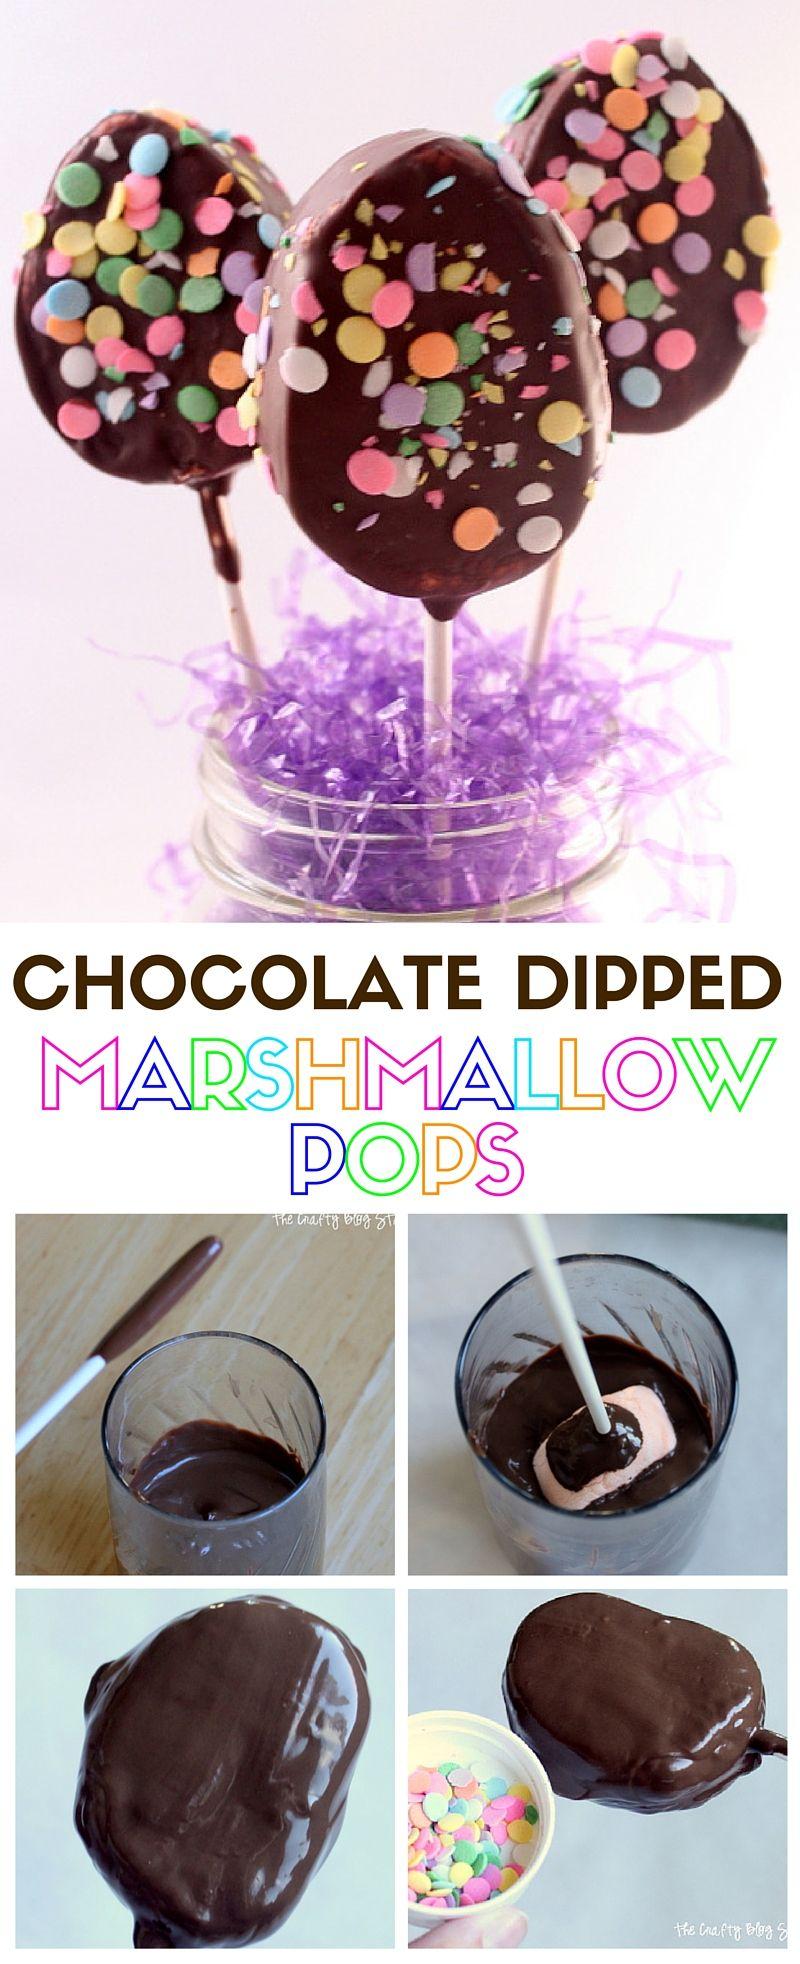 Chocolate DippedMarshmallow Pops | EasterTreat for Kids | DIY | Dessert Recipe | CandiQuik